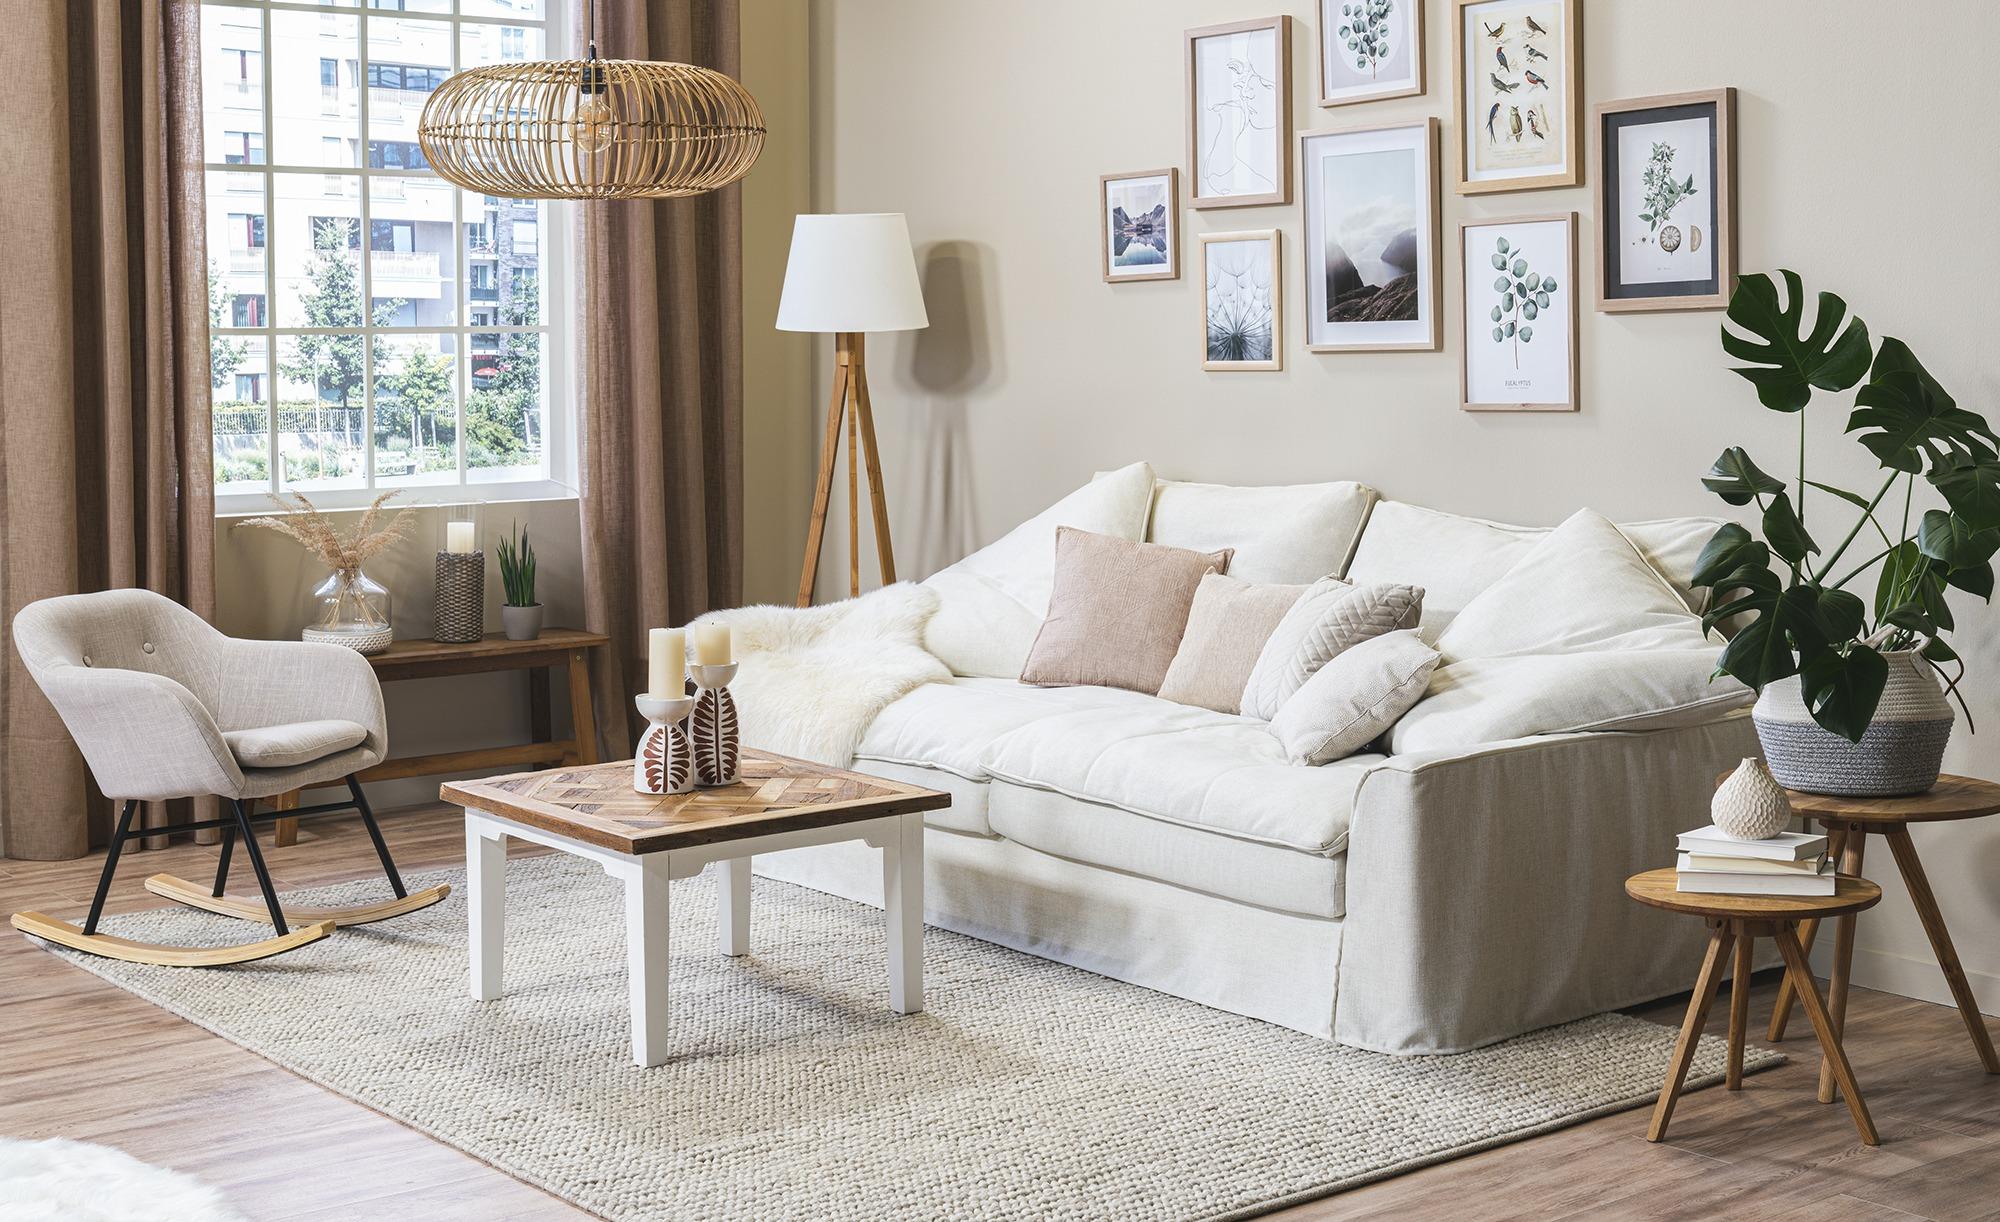 SOHO Sofa 3-sitzig  Sarvika ¦ weiß ¦ Maße (cm): B: 233 H: 95 T: 114 Polstermöbel > Sofas > 3-Sitzer - Höffner